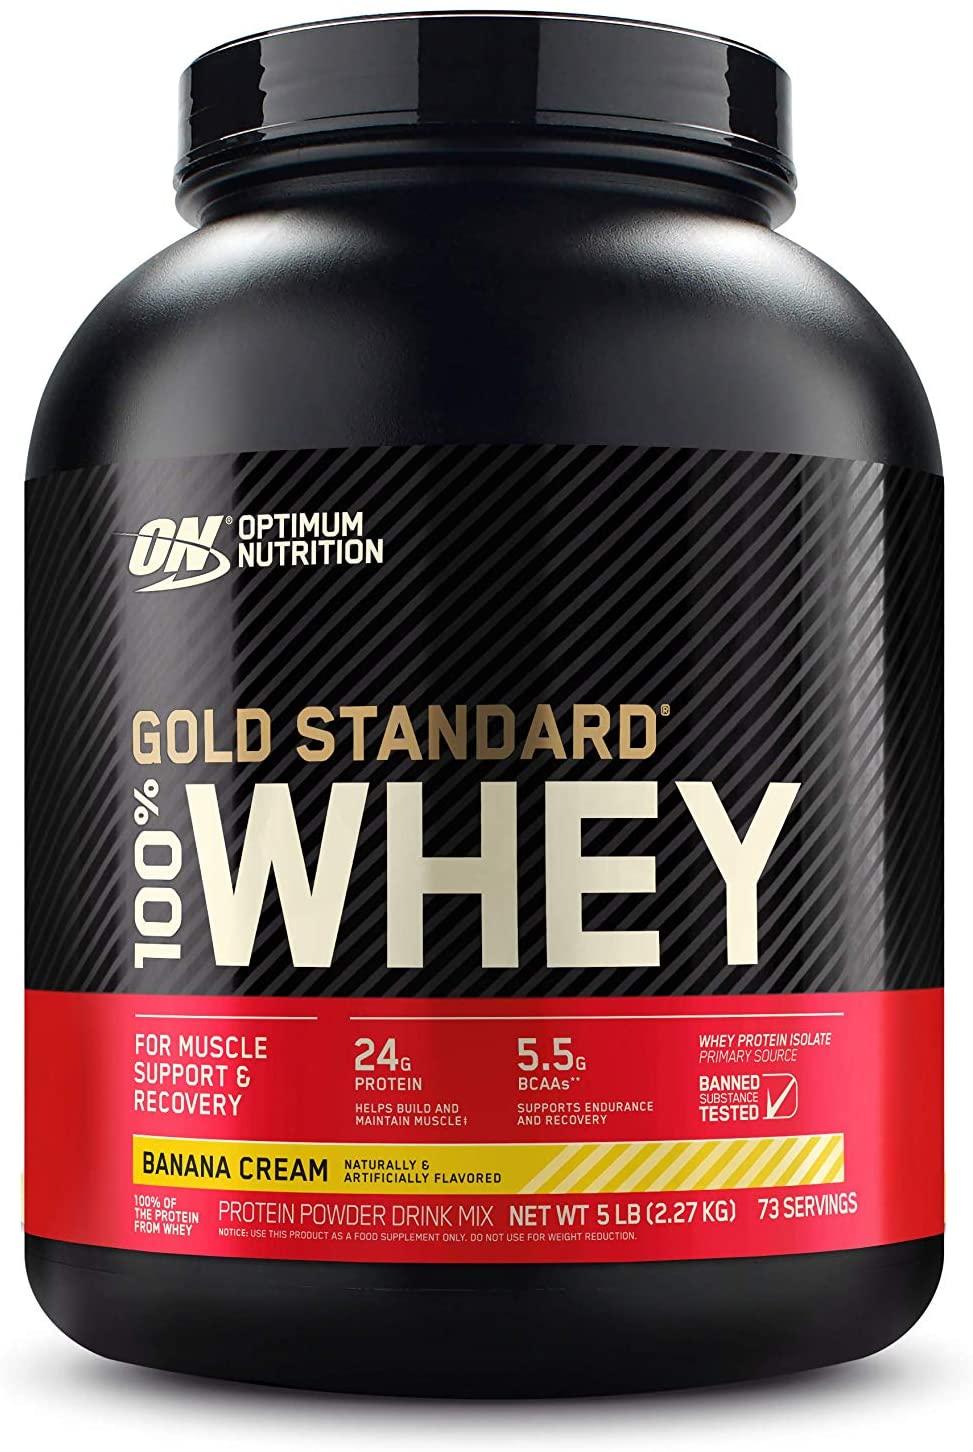 5 lb Optimum Nutrition Gold Standard 100% Whey Protein Powder, Banana Cream, $38.36 w/ S&S, Amazon